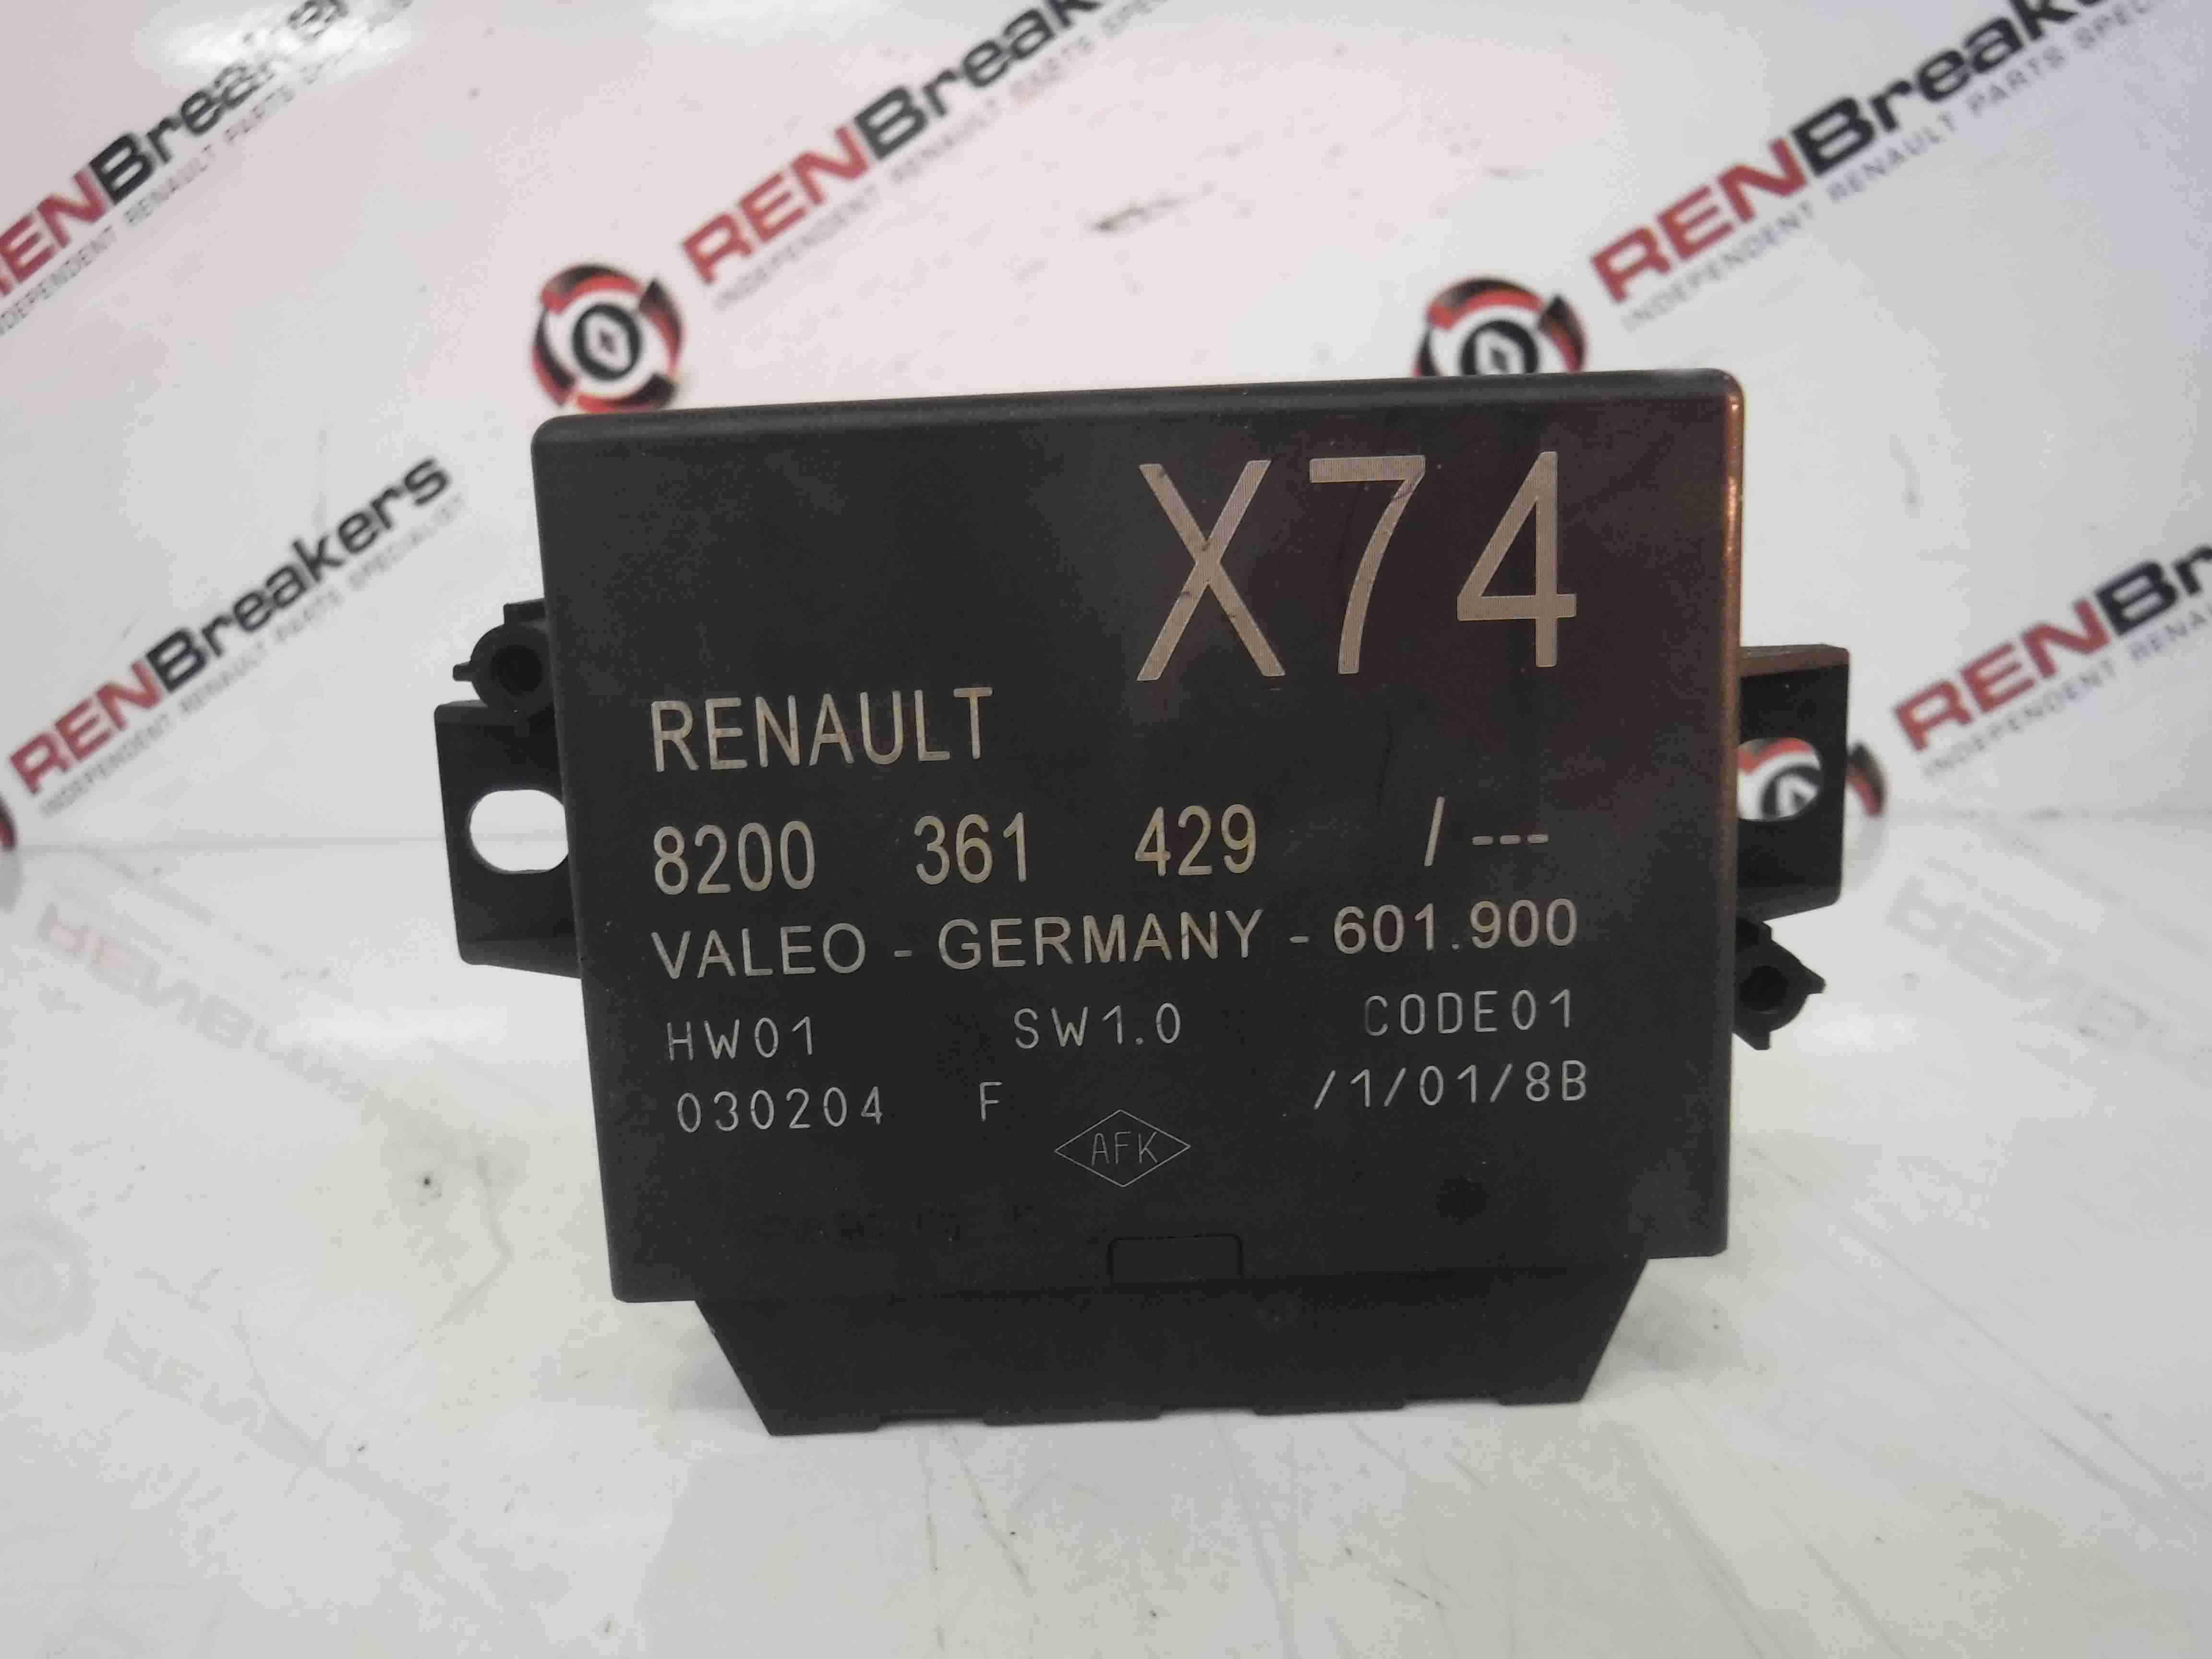 Renault Laguna Espace 2001-2005 Parking Distance Control Module ECU 8200361429